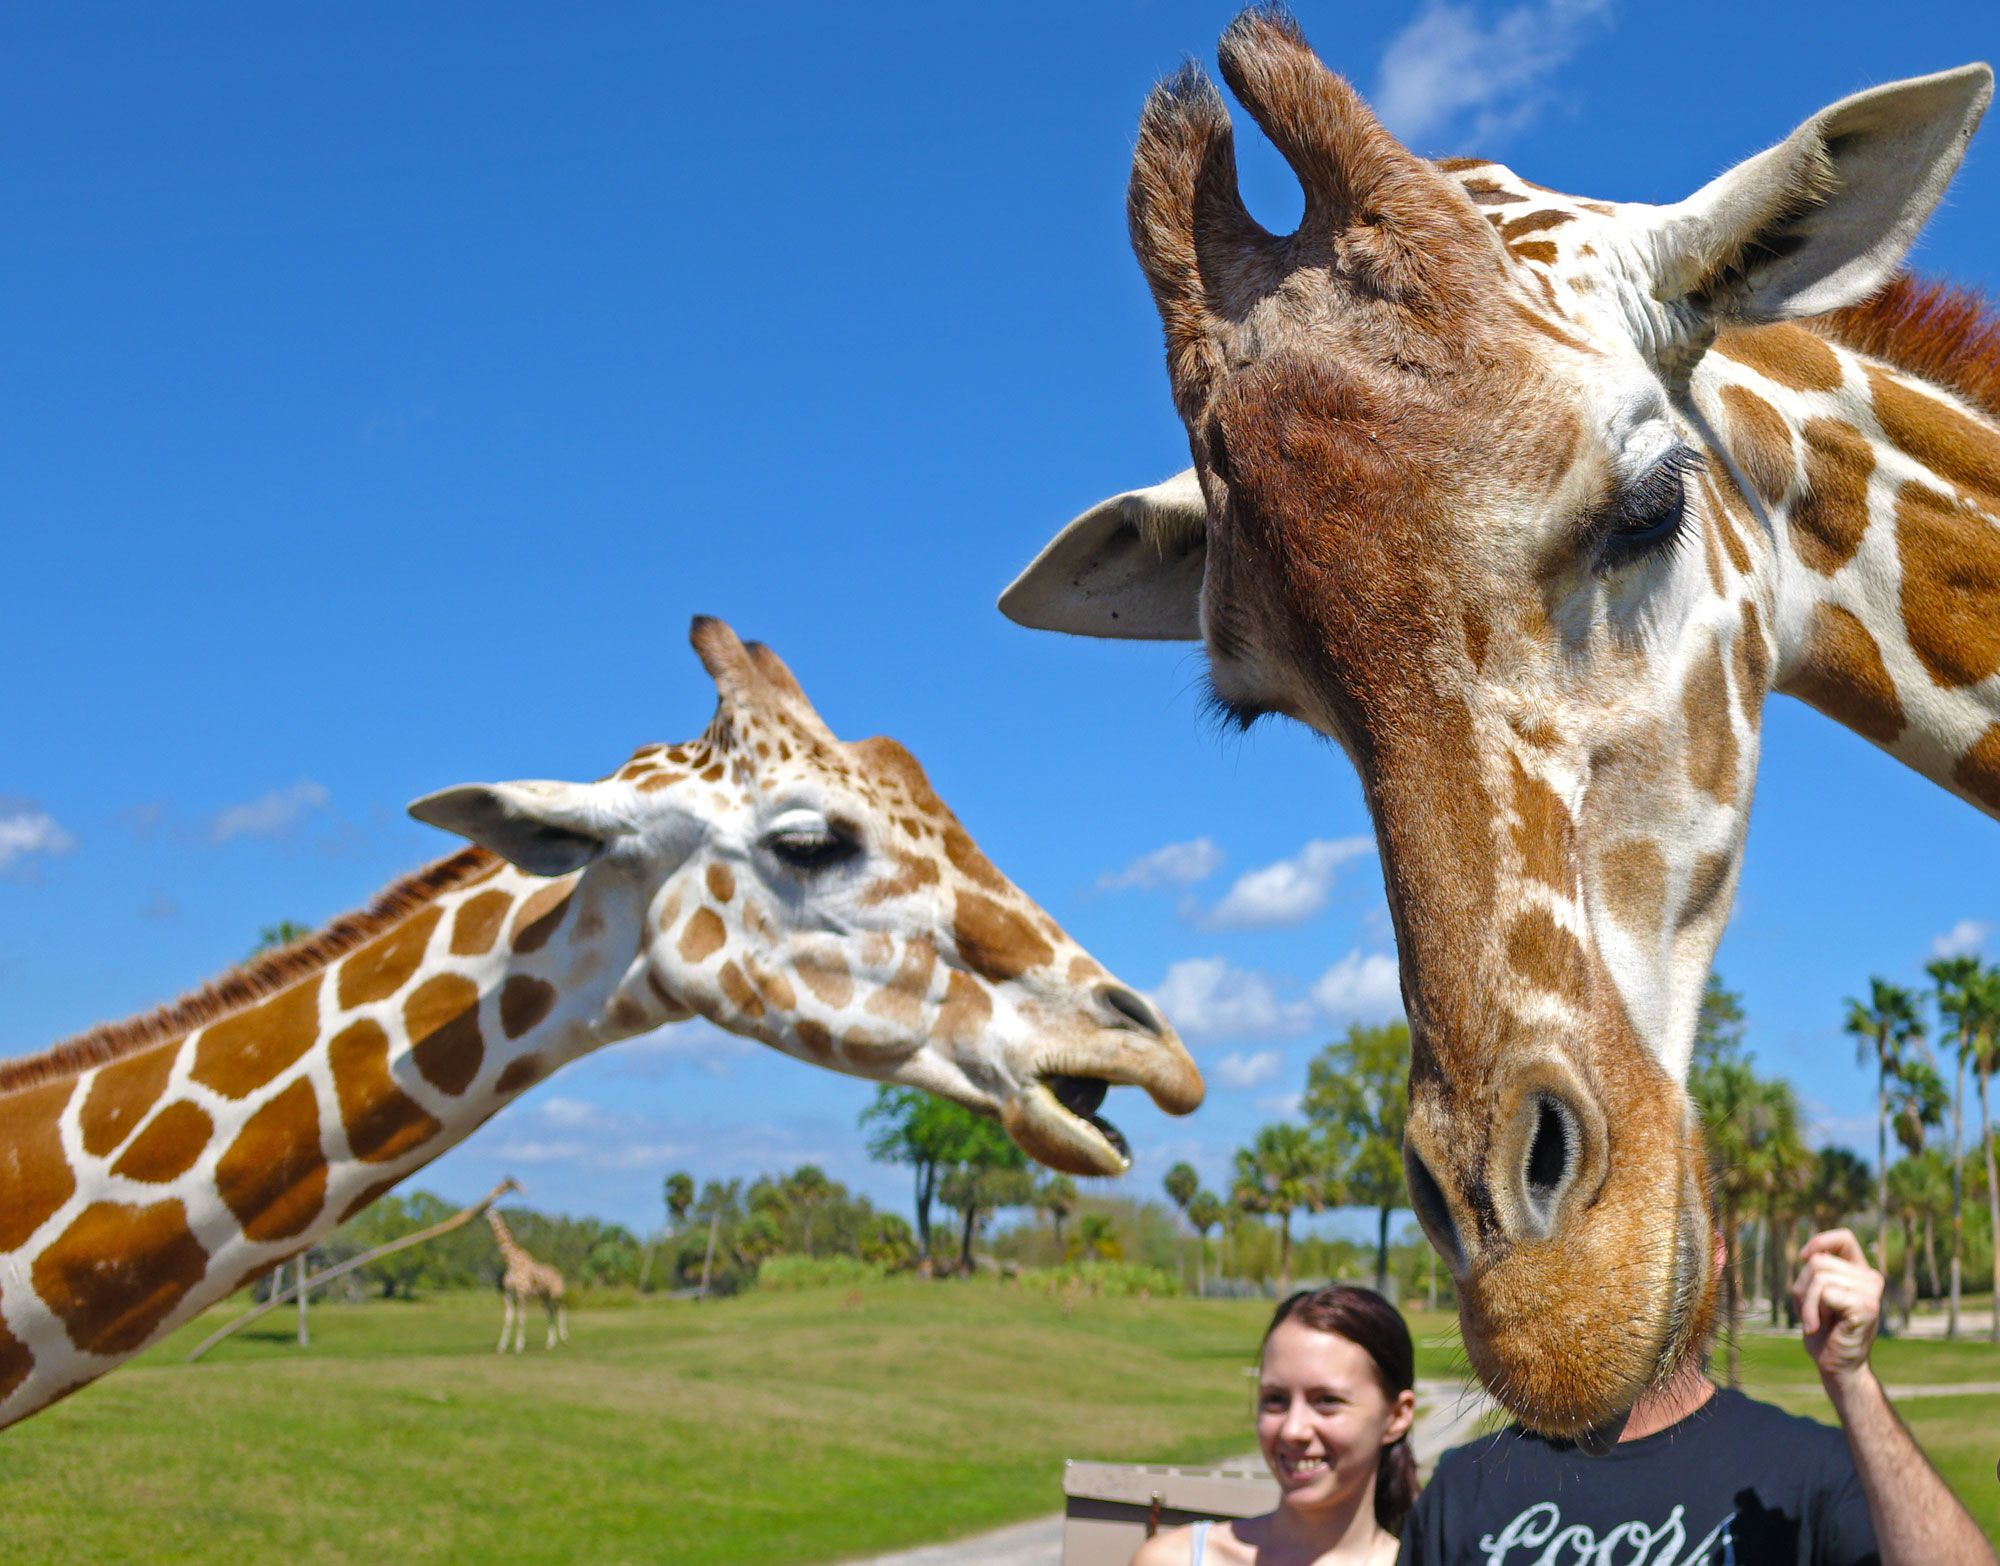 5e9671f25d6fedbf709ed0ede83055d6 - Is The Safari Included In Busch Gardens